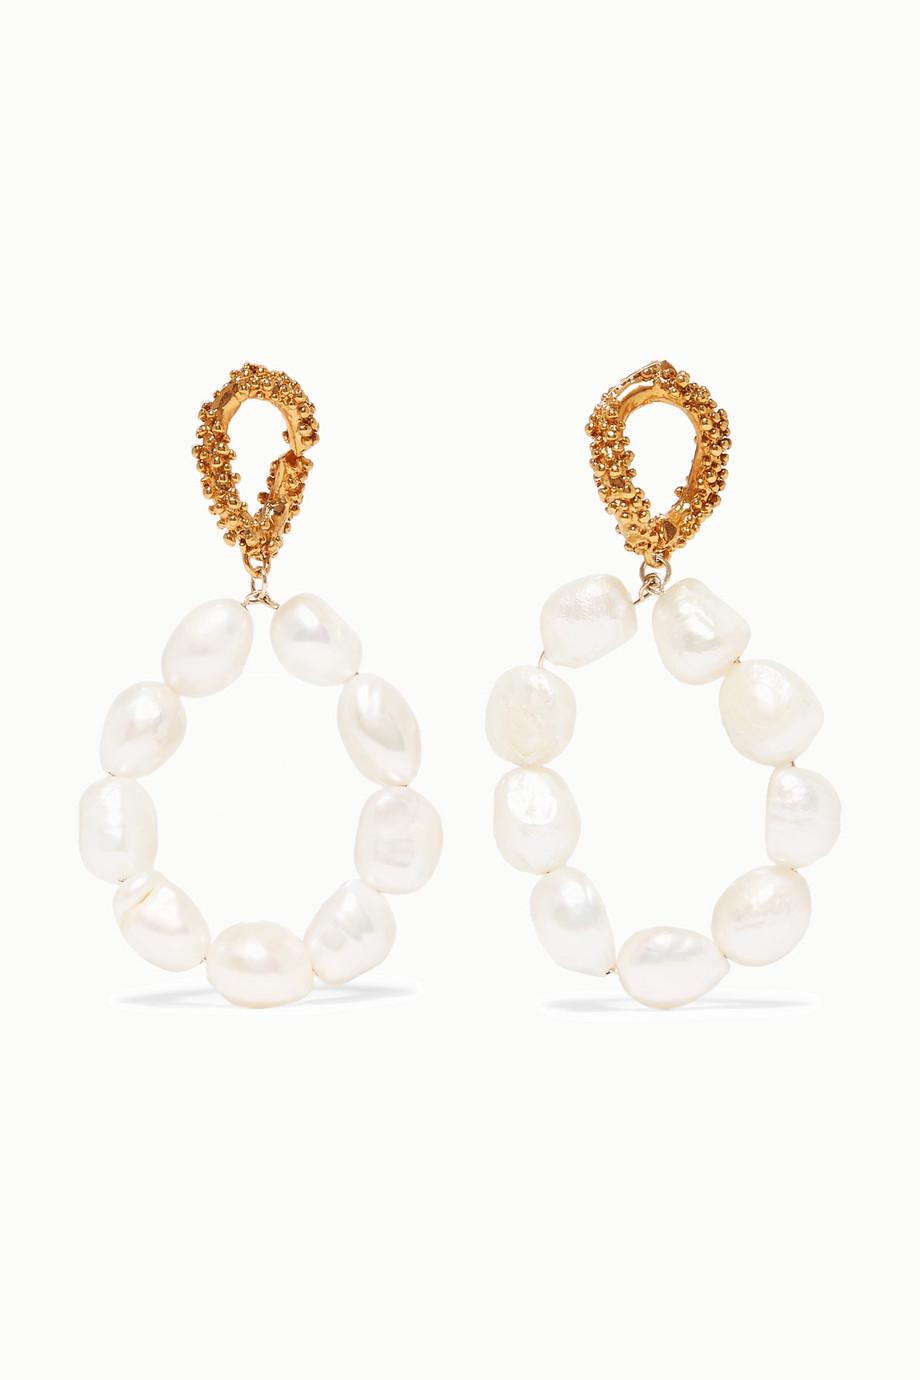 Alighieri Apollo's Dance gold-plated pearl earrings